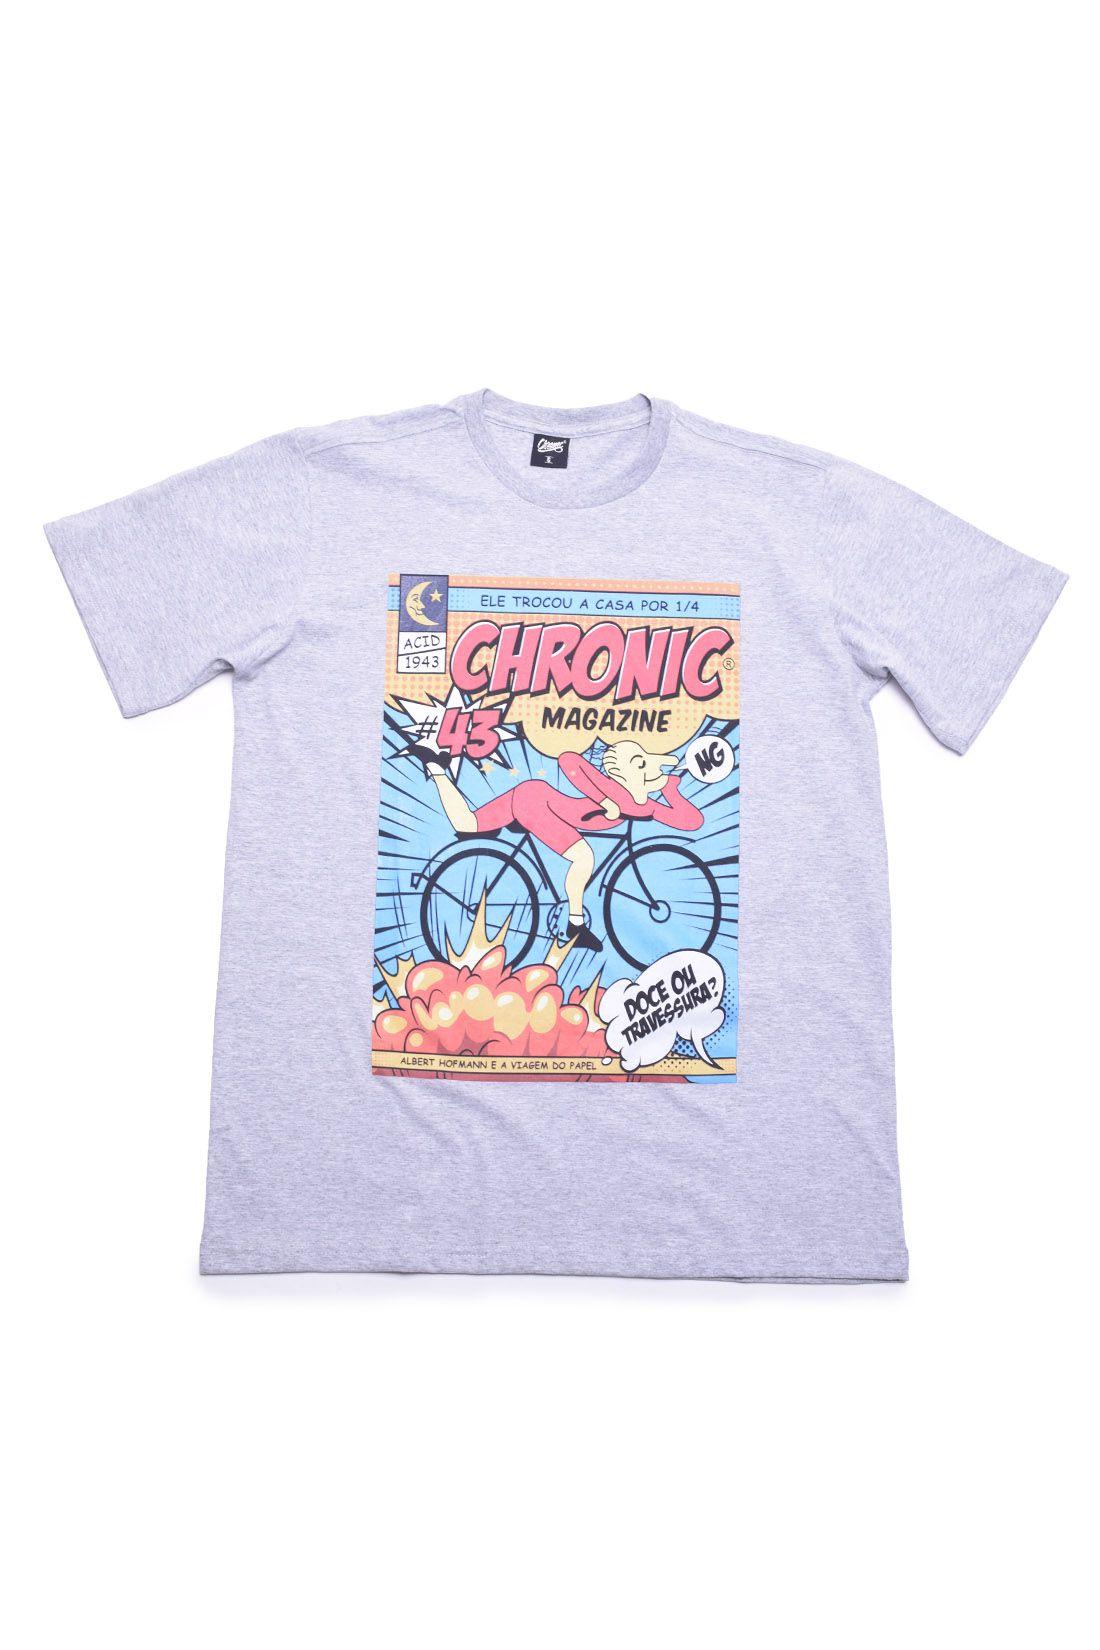 Camiseta Doce ou Travessura Chronic